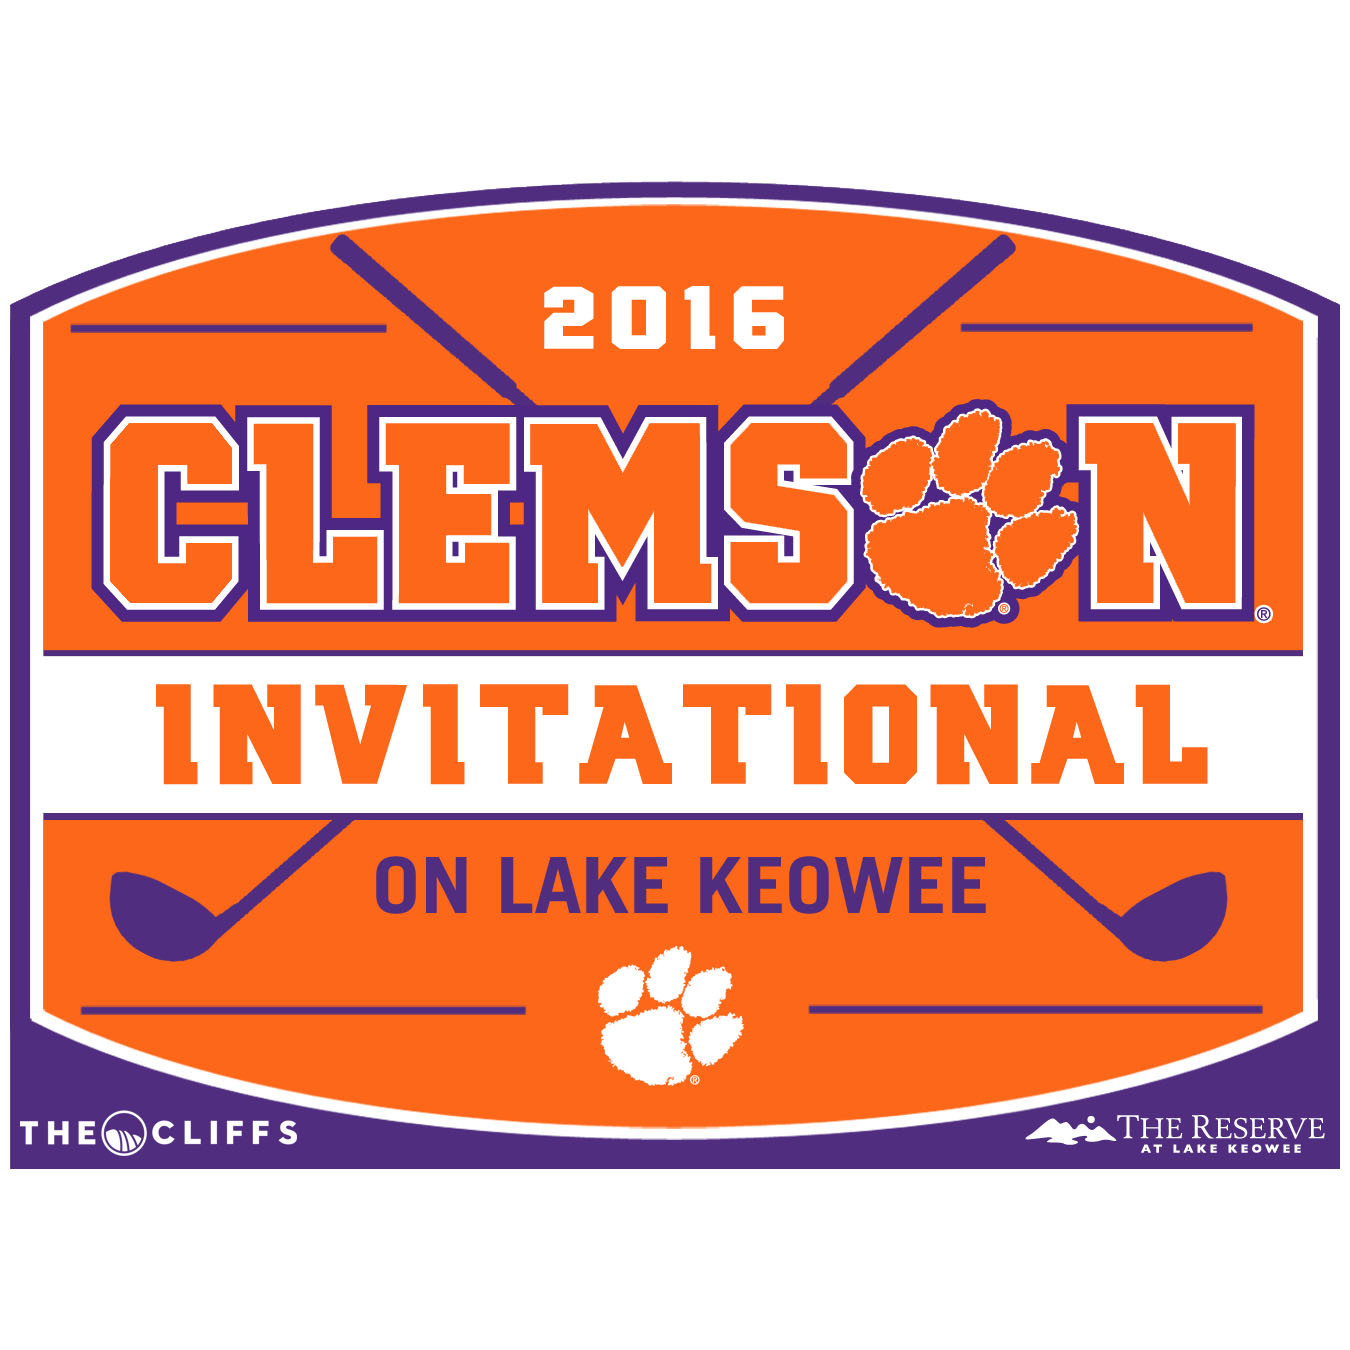 Clemson To Host Men's and Women's Golf Tourneys